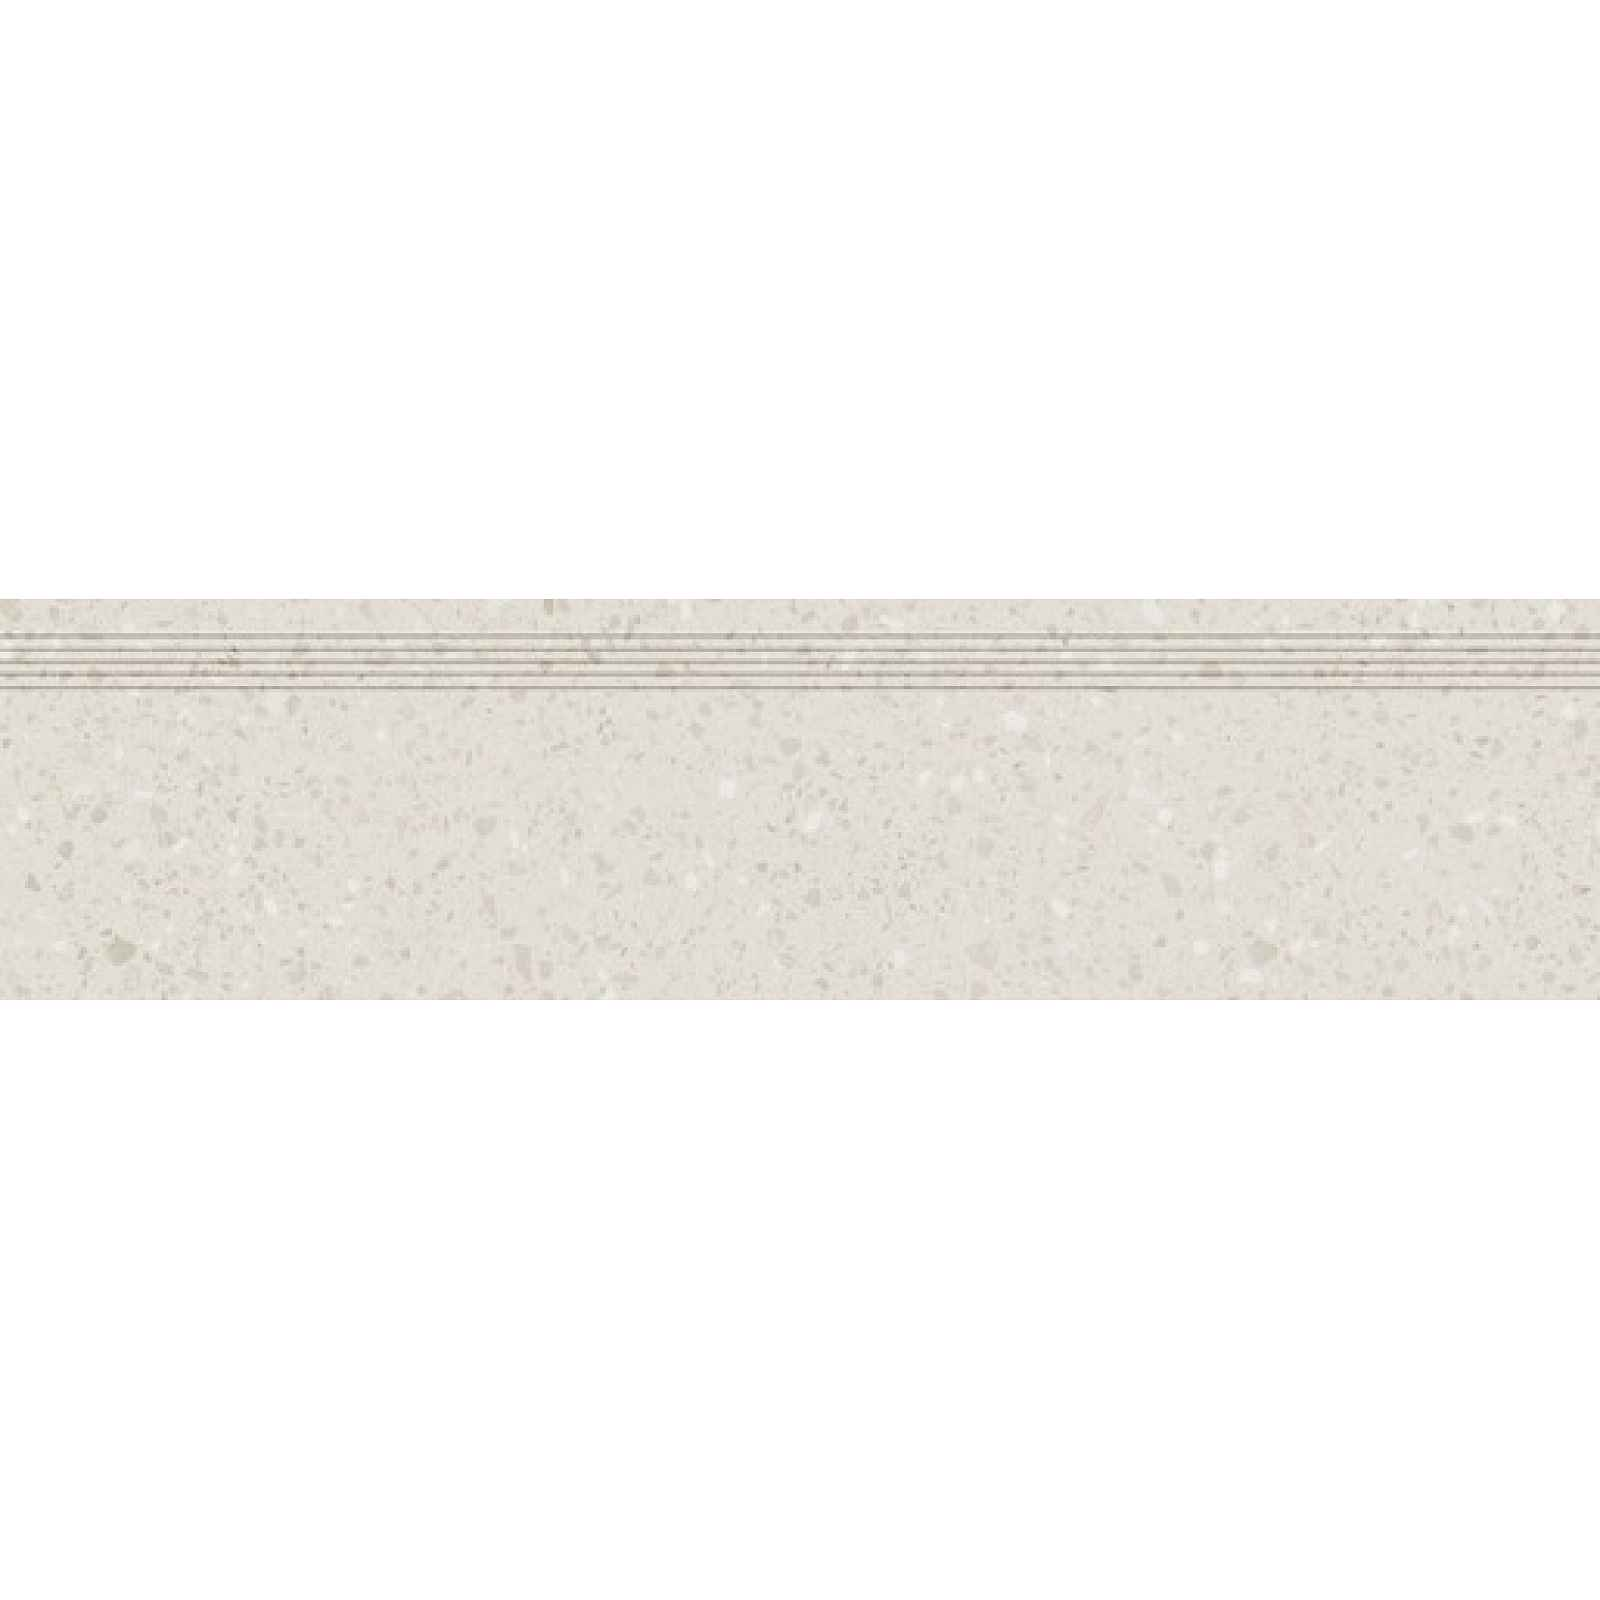 Schodovka RAKO Porfido béžová 30x120 cm mat / lesk DCPVF813.1